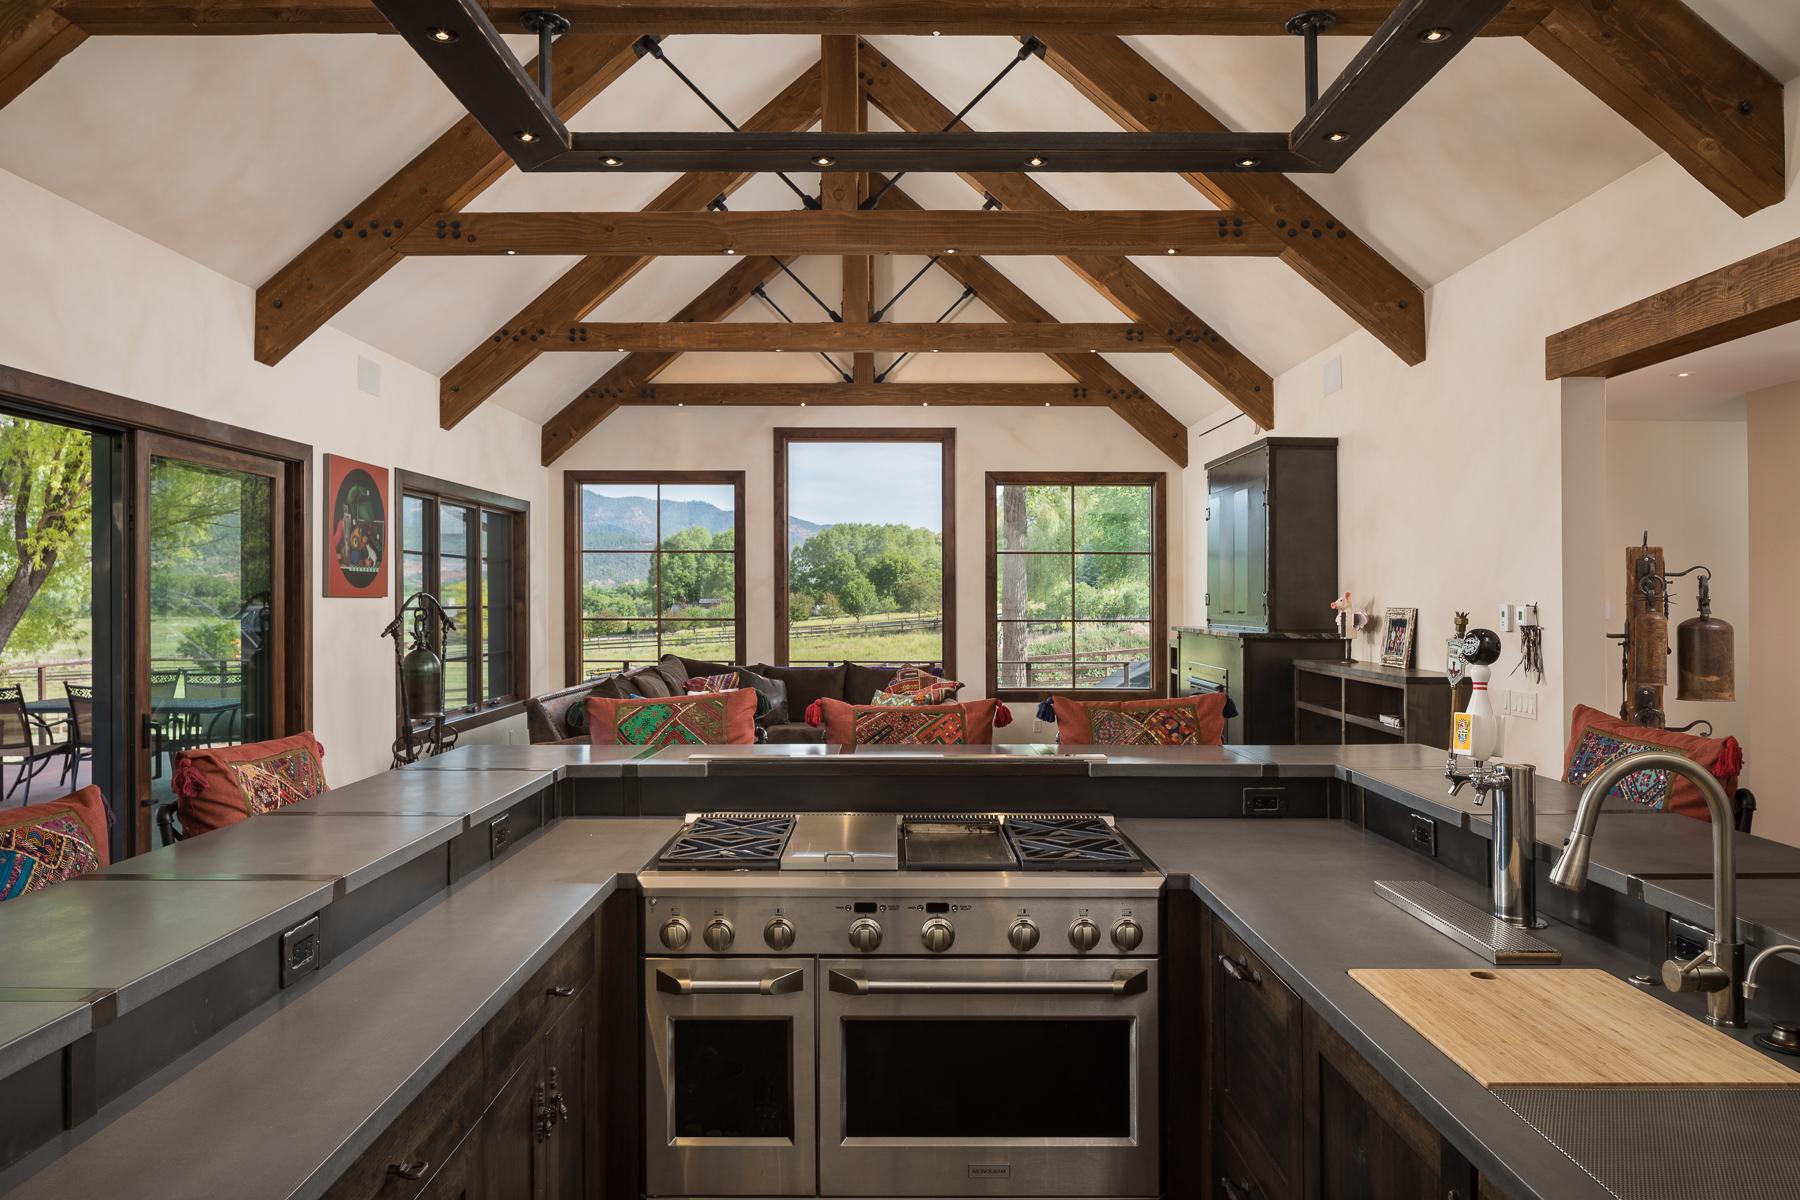 Concrete Kitchen Island with Steel Inlay.jpg